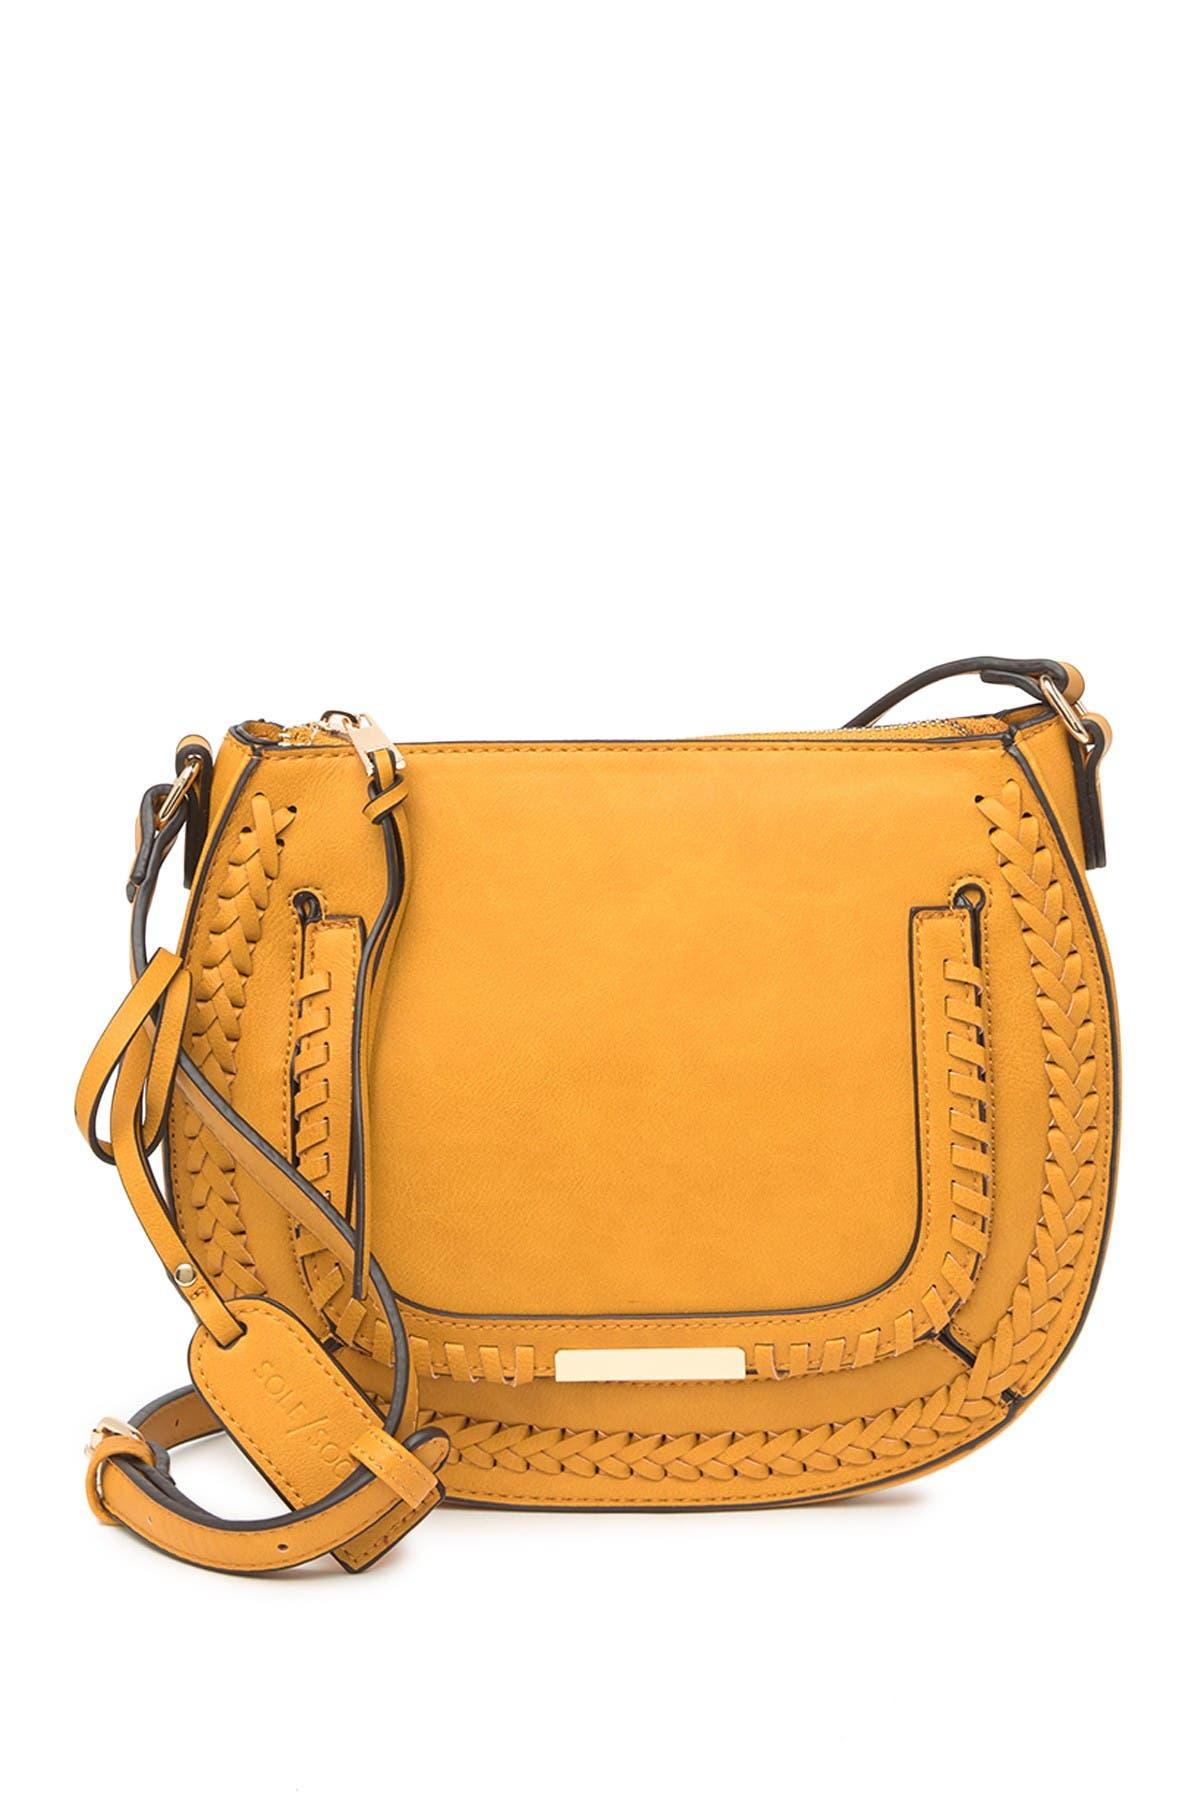 Image of Sole Society Dayla Whipstitch Crossbody Bag